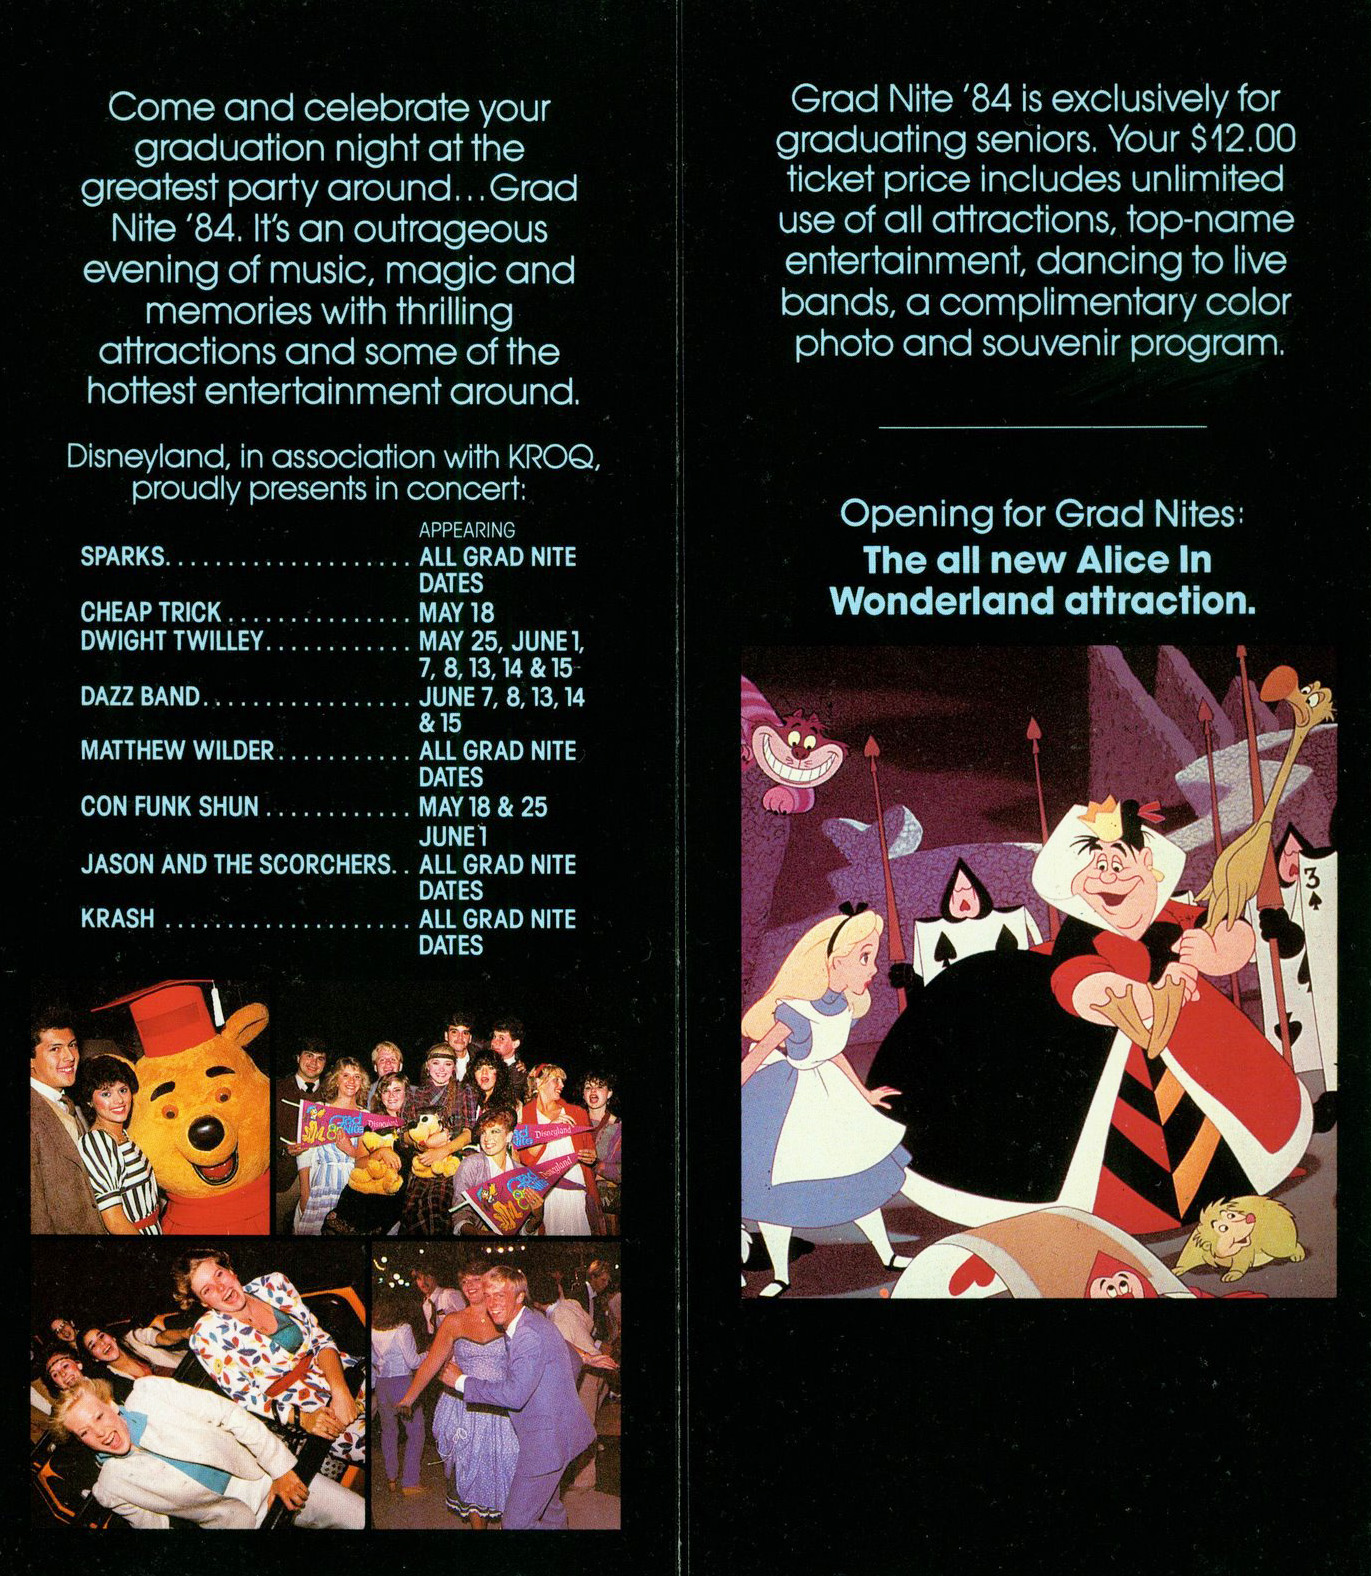 Vintage Disneyland Tickets: Grad Nite 82!